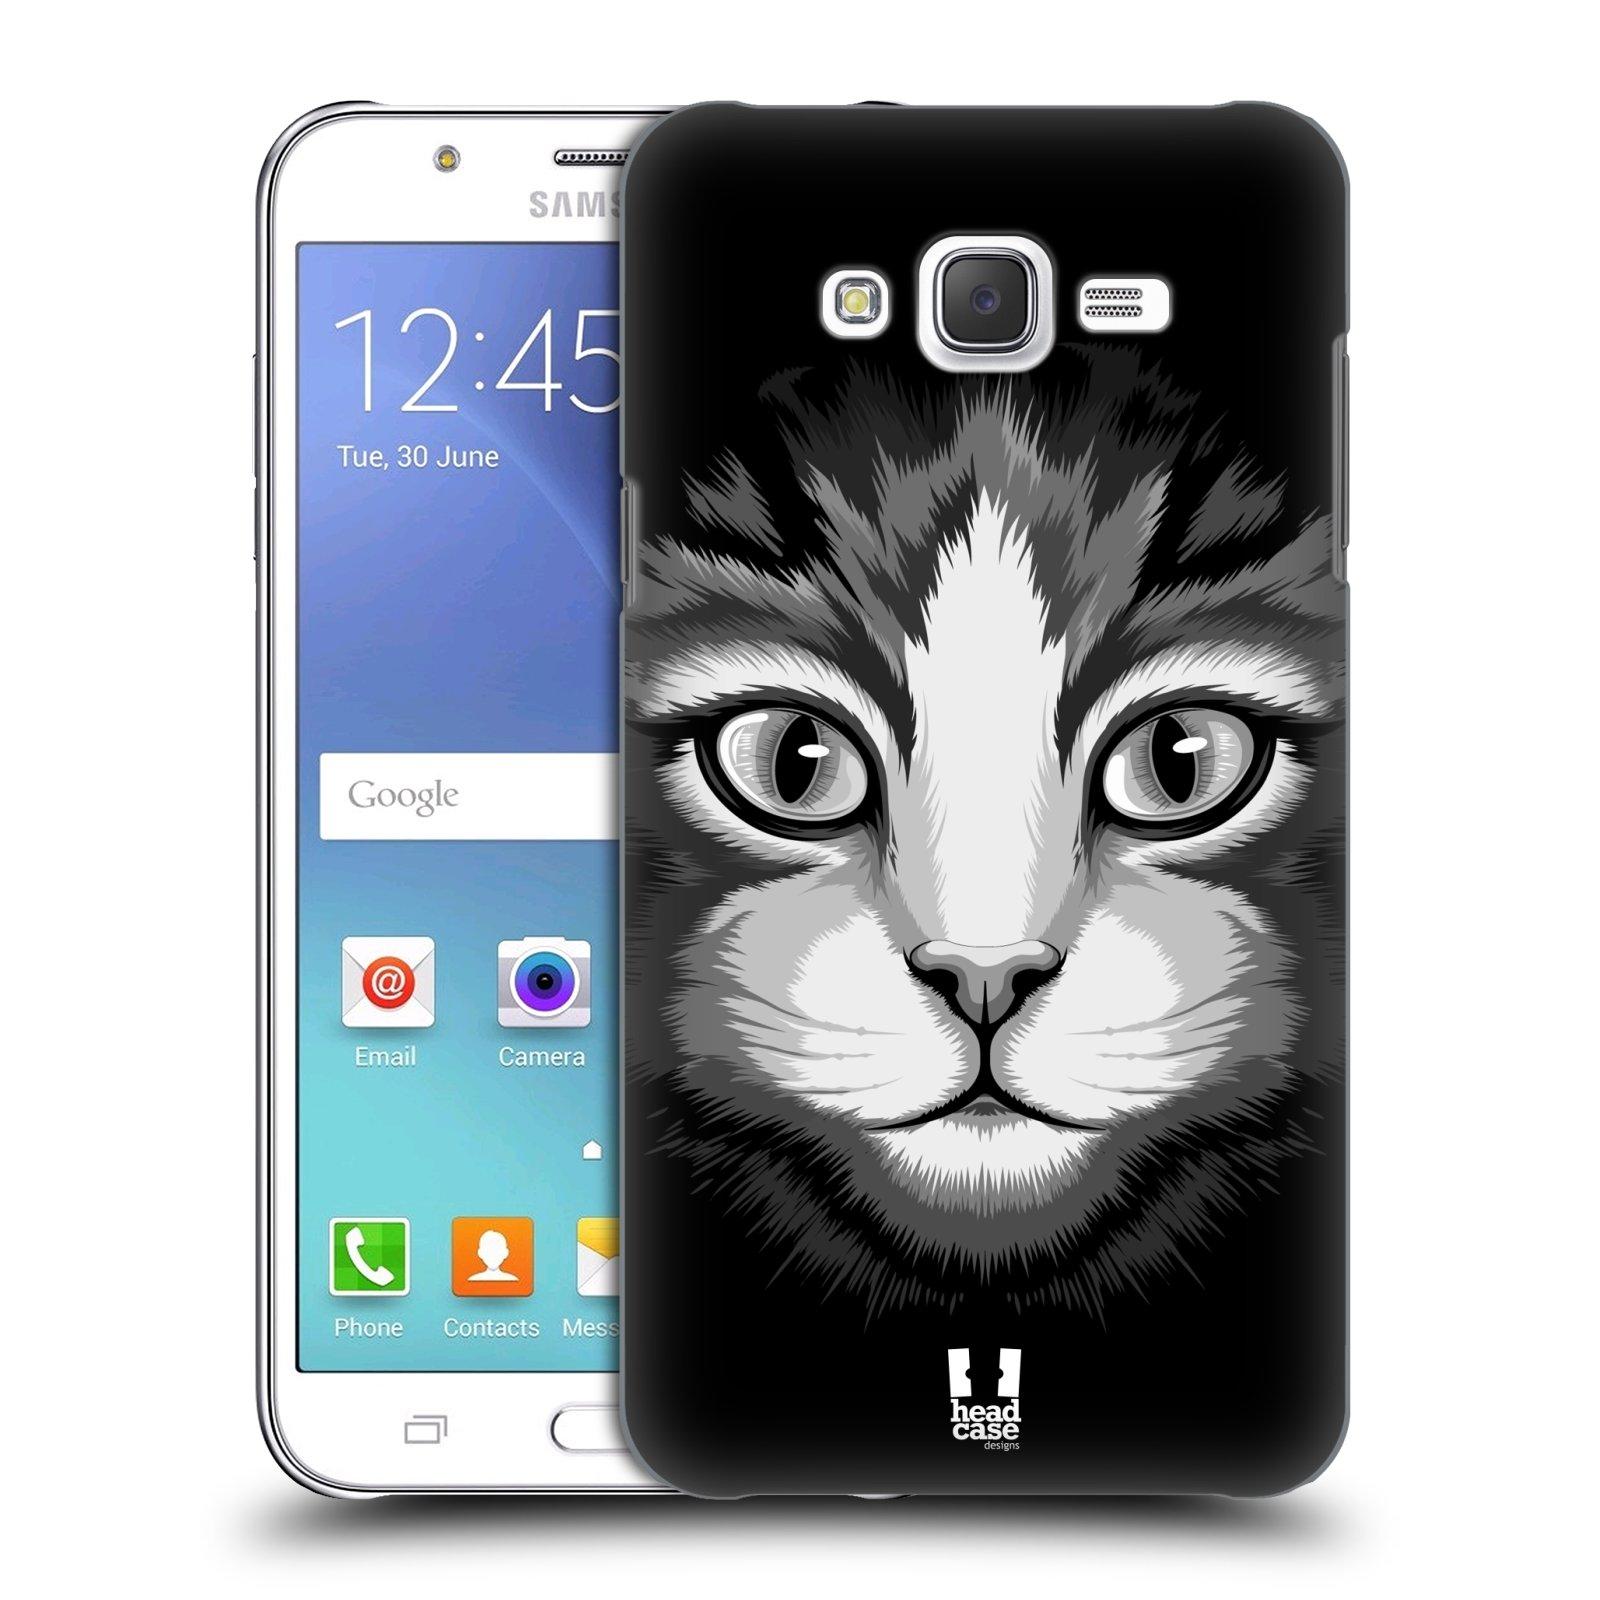 HEAD CASE plastový obal na mobil SAMSUNG Galaxy J7, J700 vzor Zvíře kreslená tvář 2 kočička